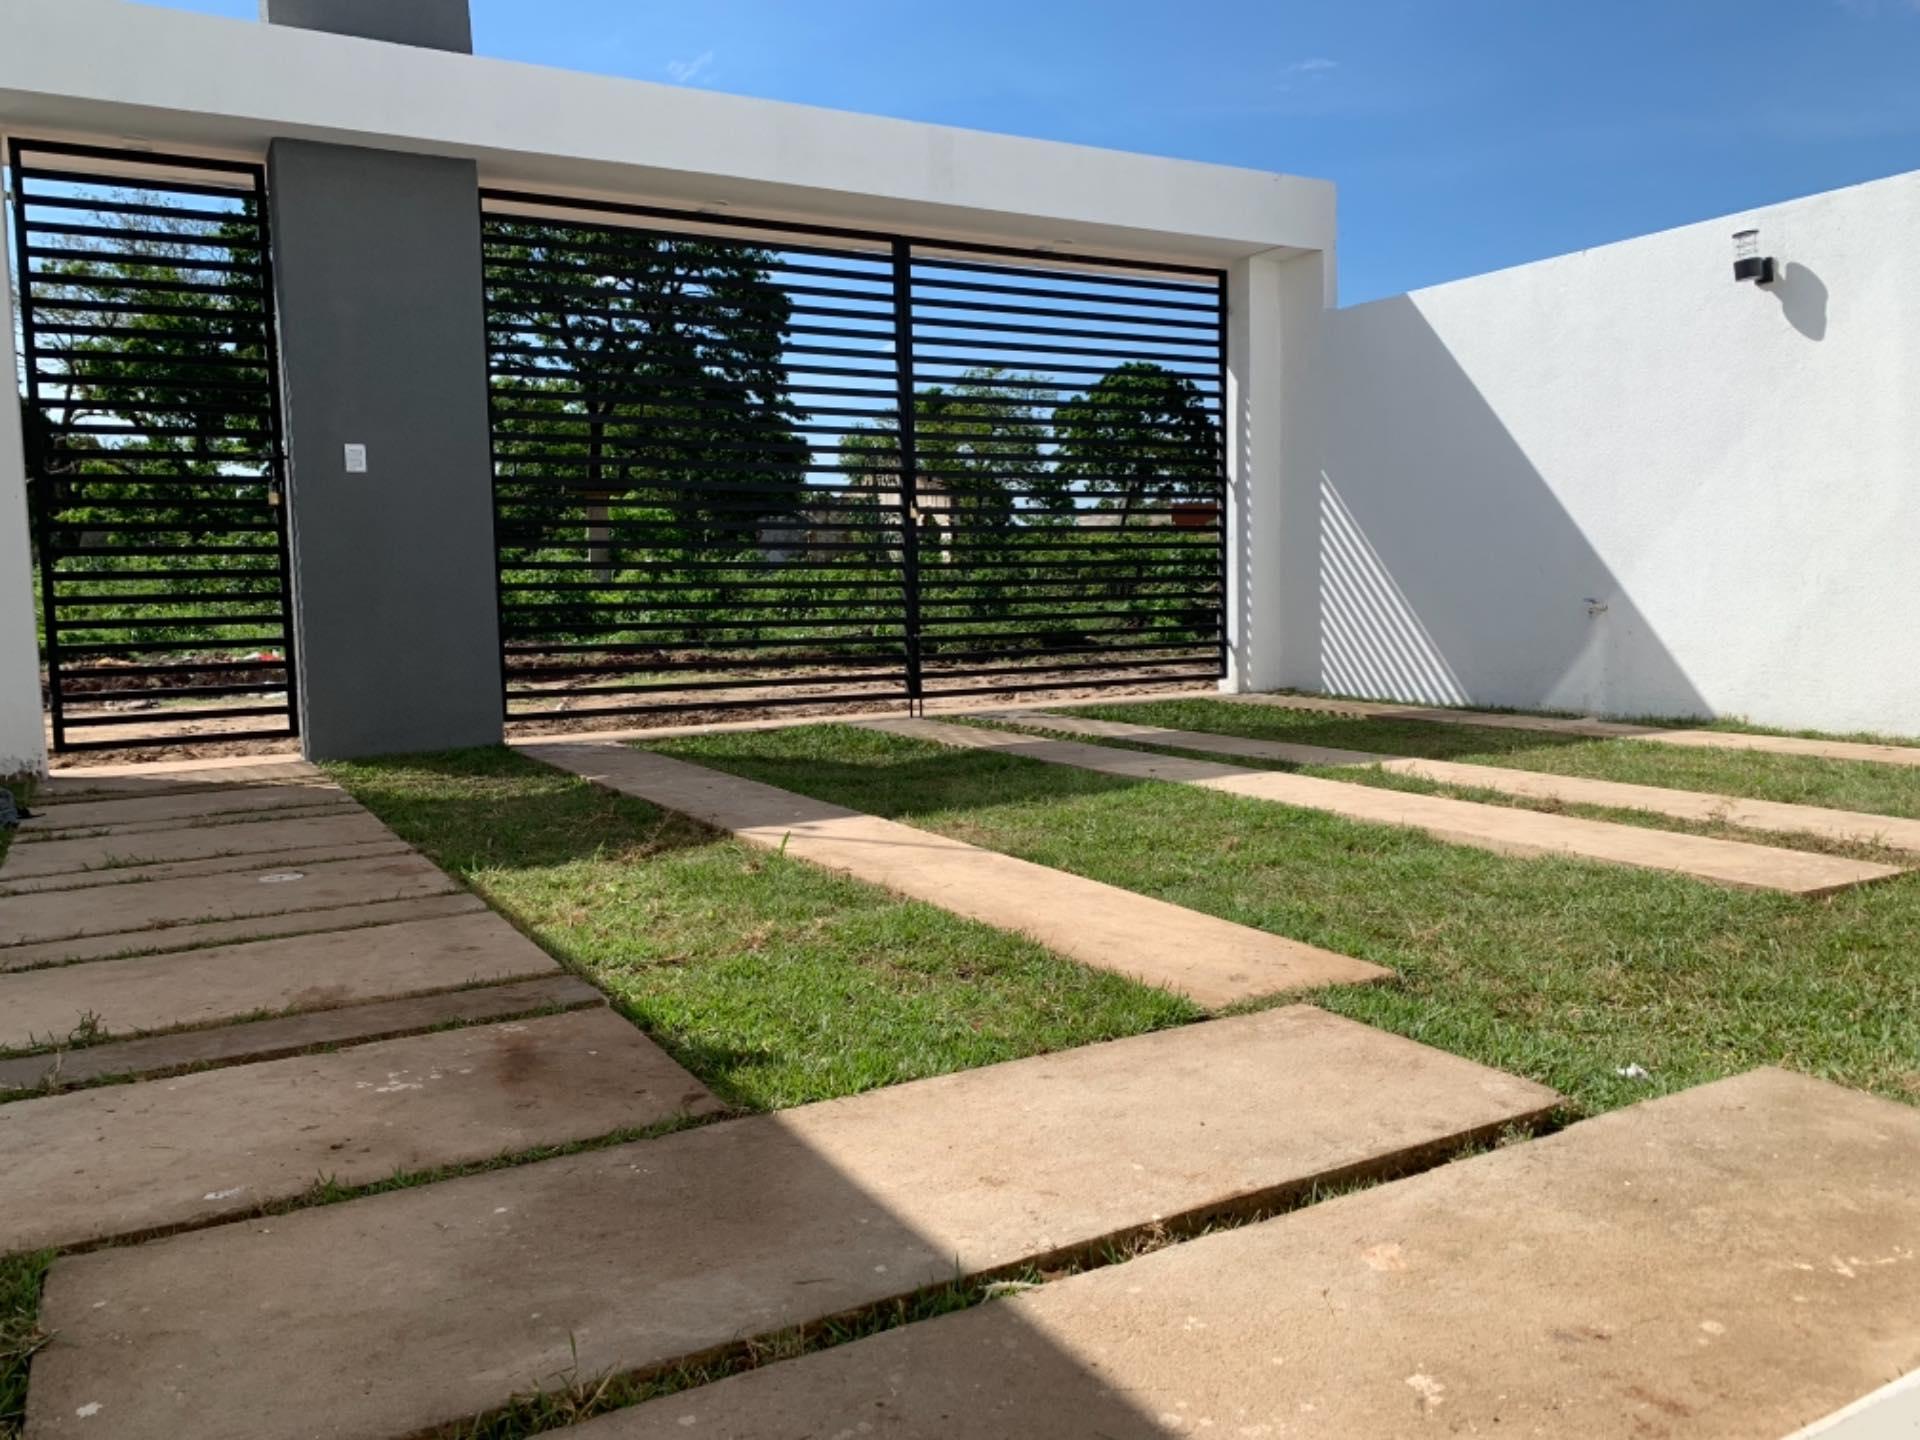 Casa en Venta Zona Doble Via La Guardia Av. Olímpica 8vo. Anillo Foto 4